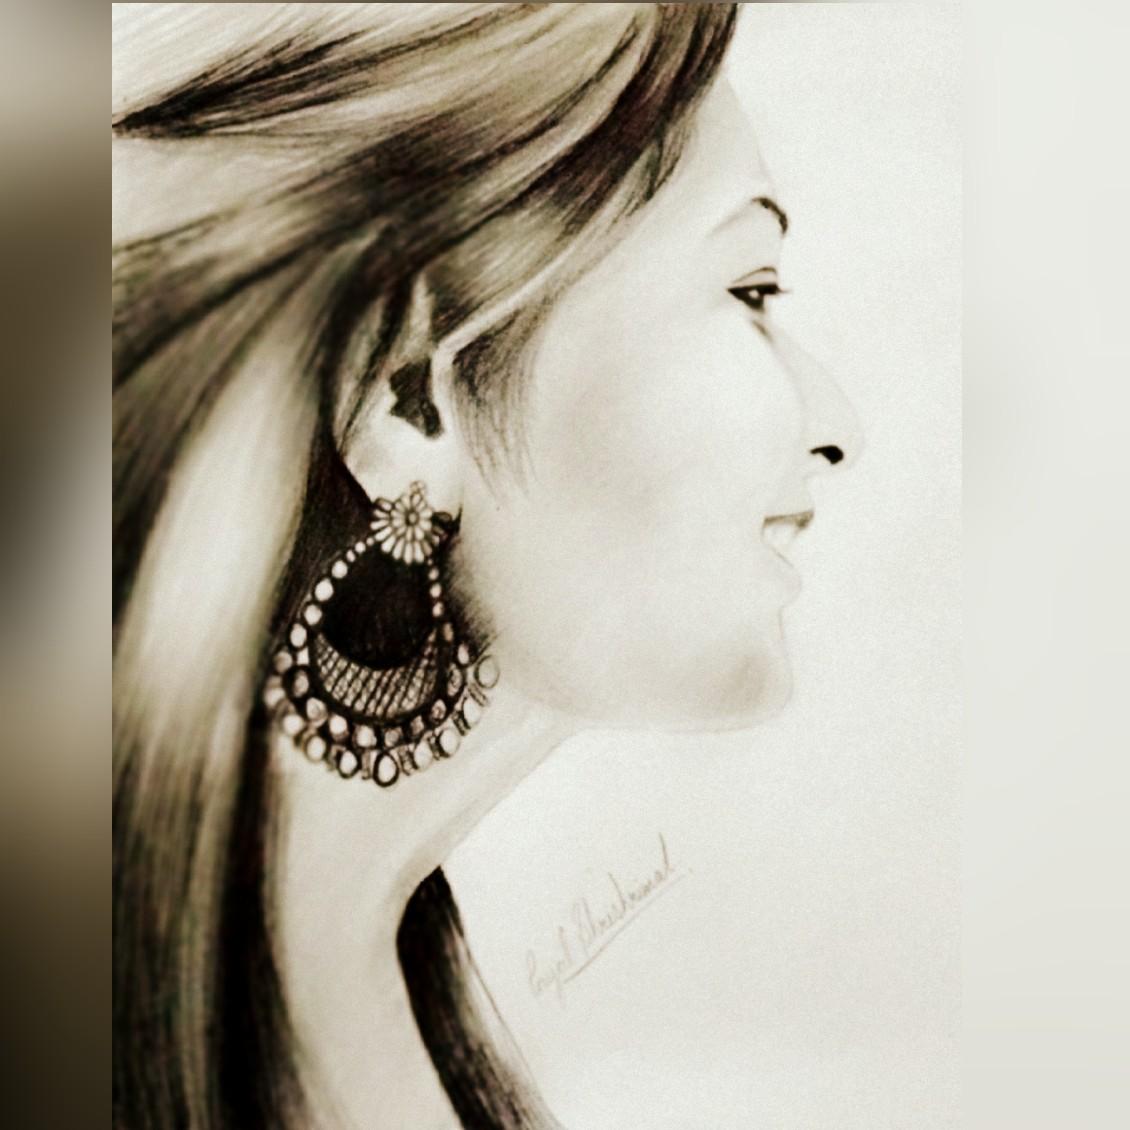 drawing by Payal Shrishrimal